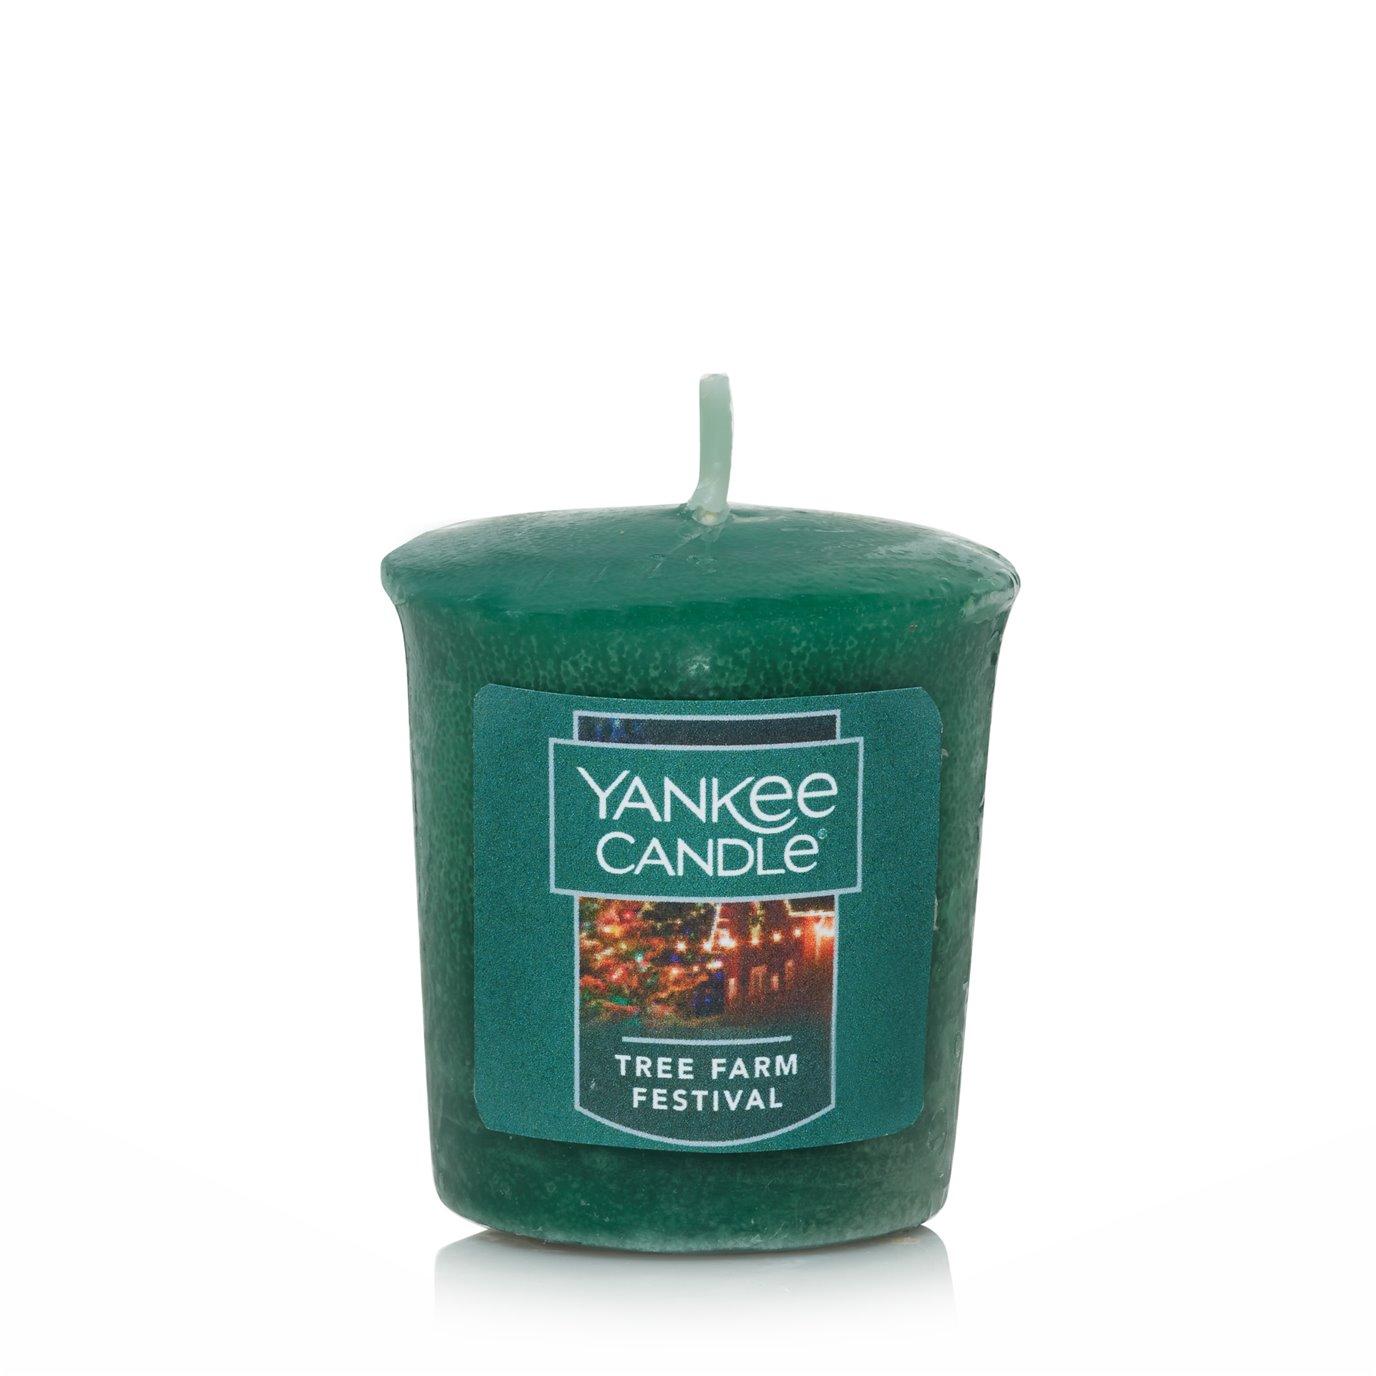 Yankee Candle Tree Farm Festival Sampler Votive